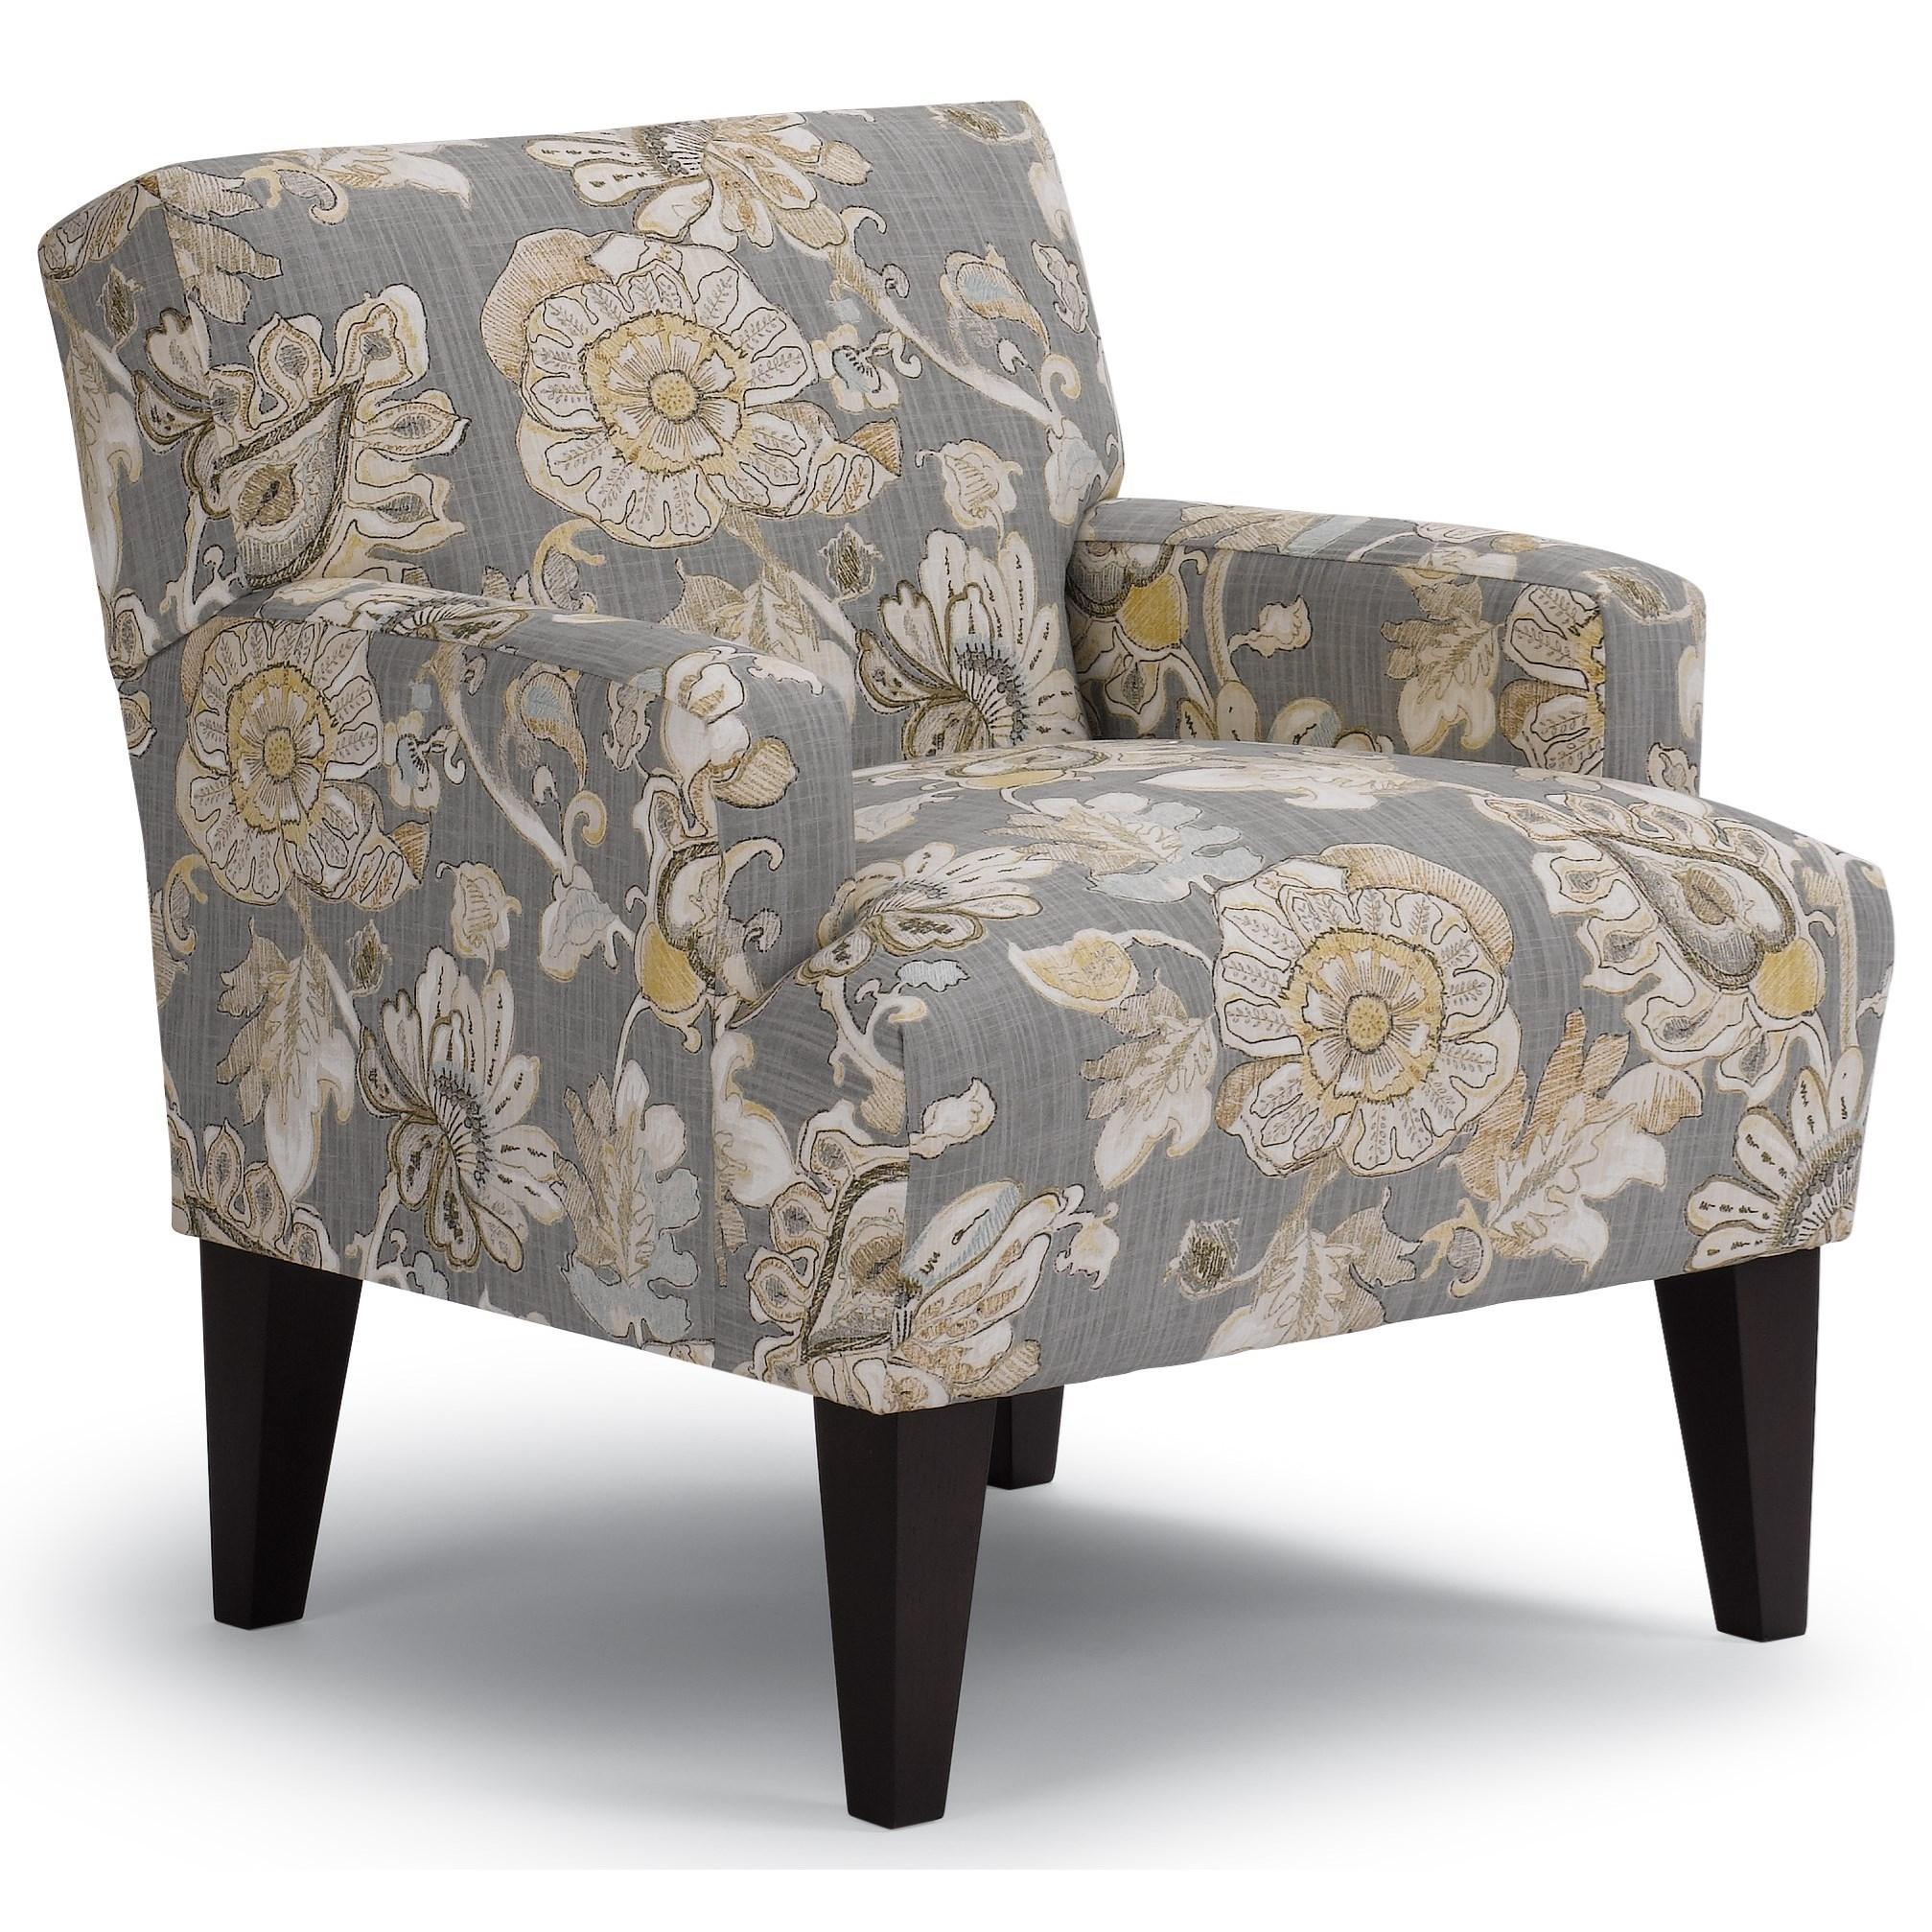 Club Chairs Randi Club Chair by Best Home Furnishings at Lapeer Furniture & Mattress Center